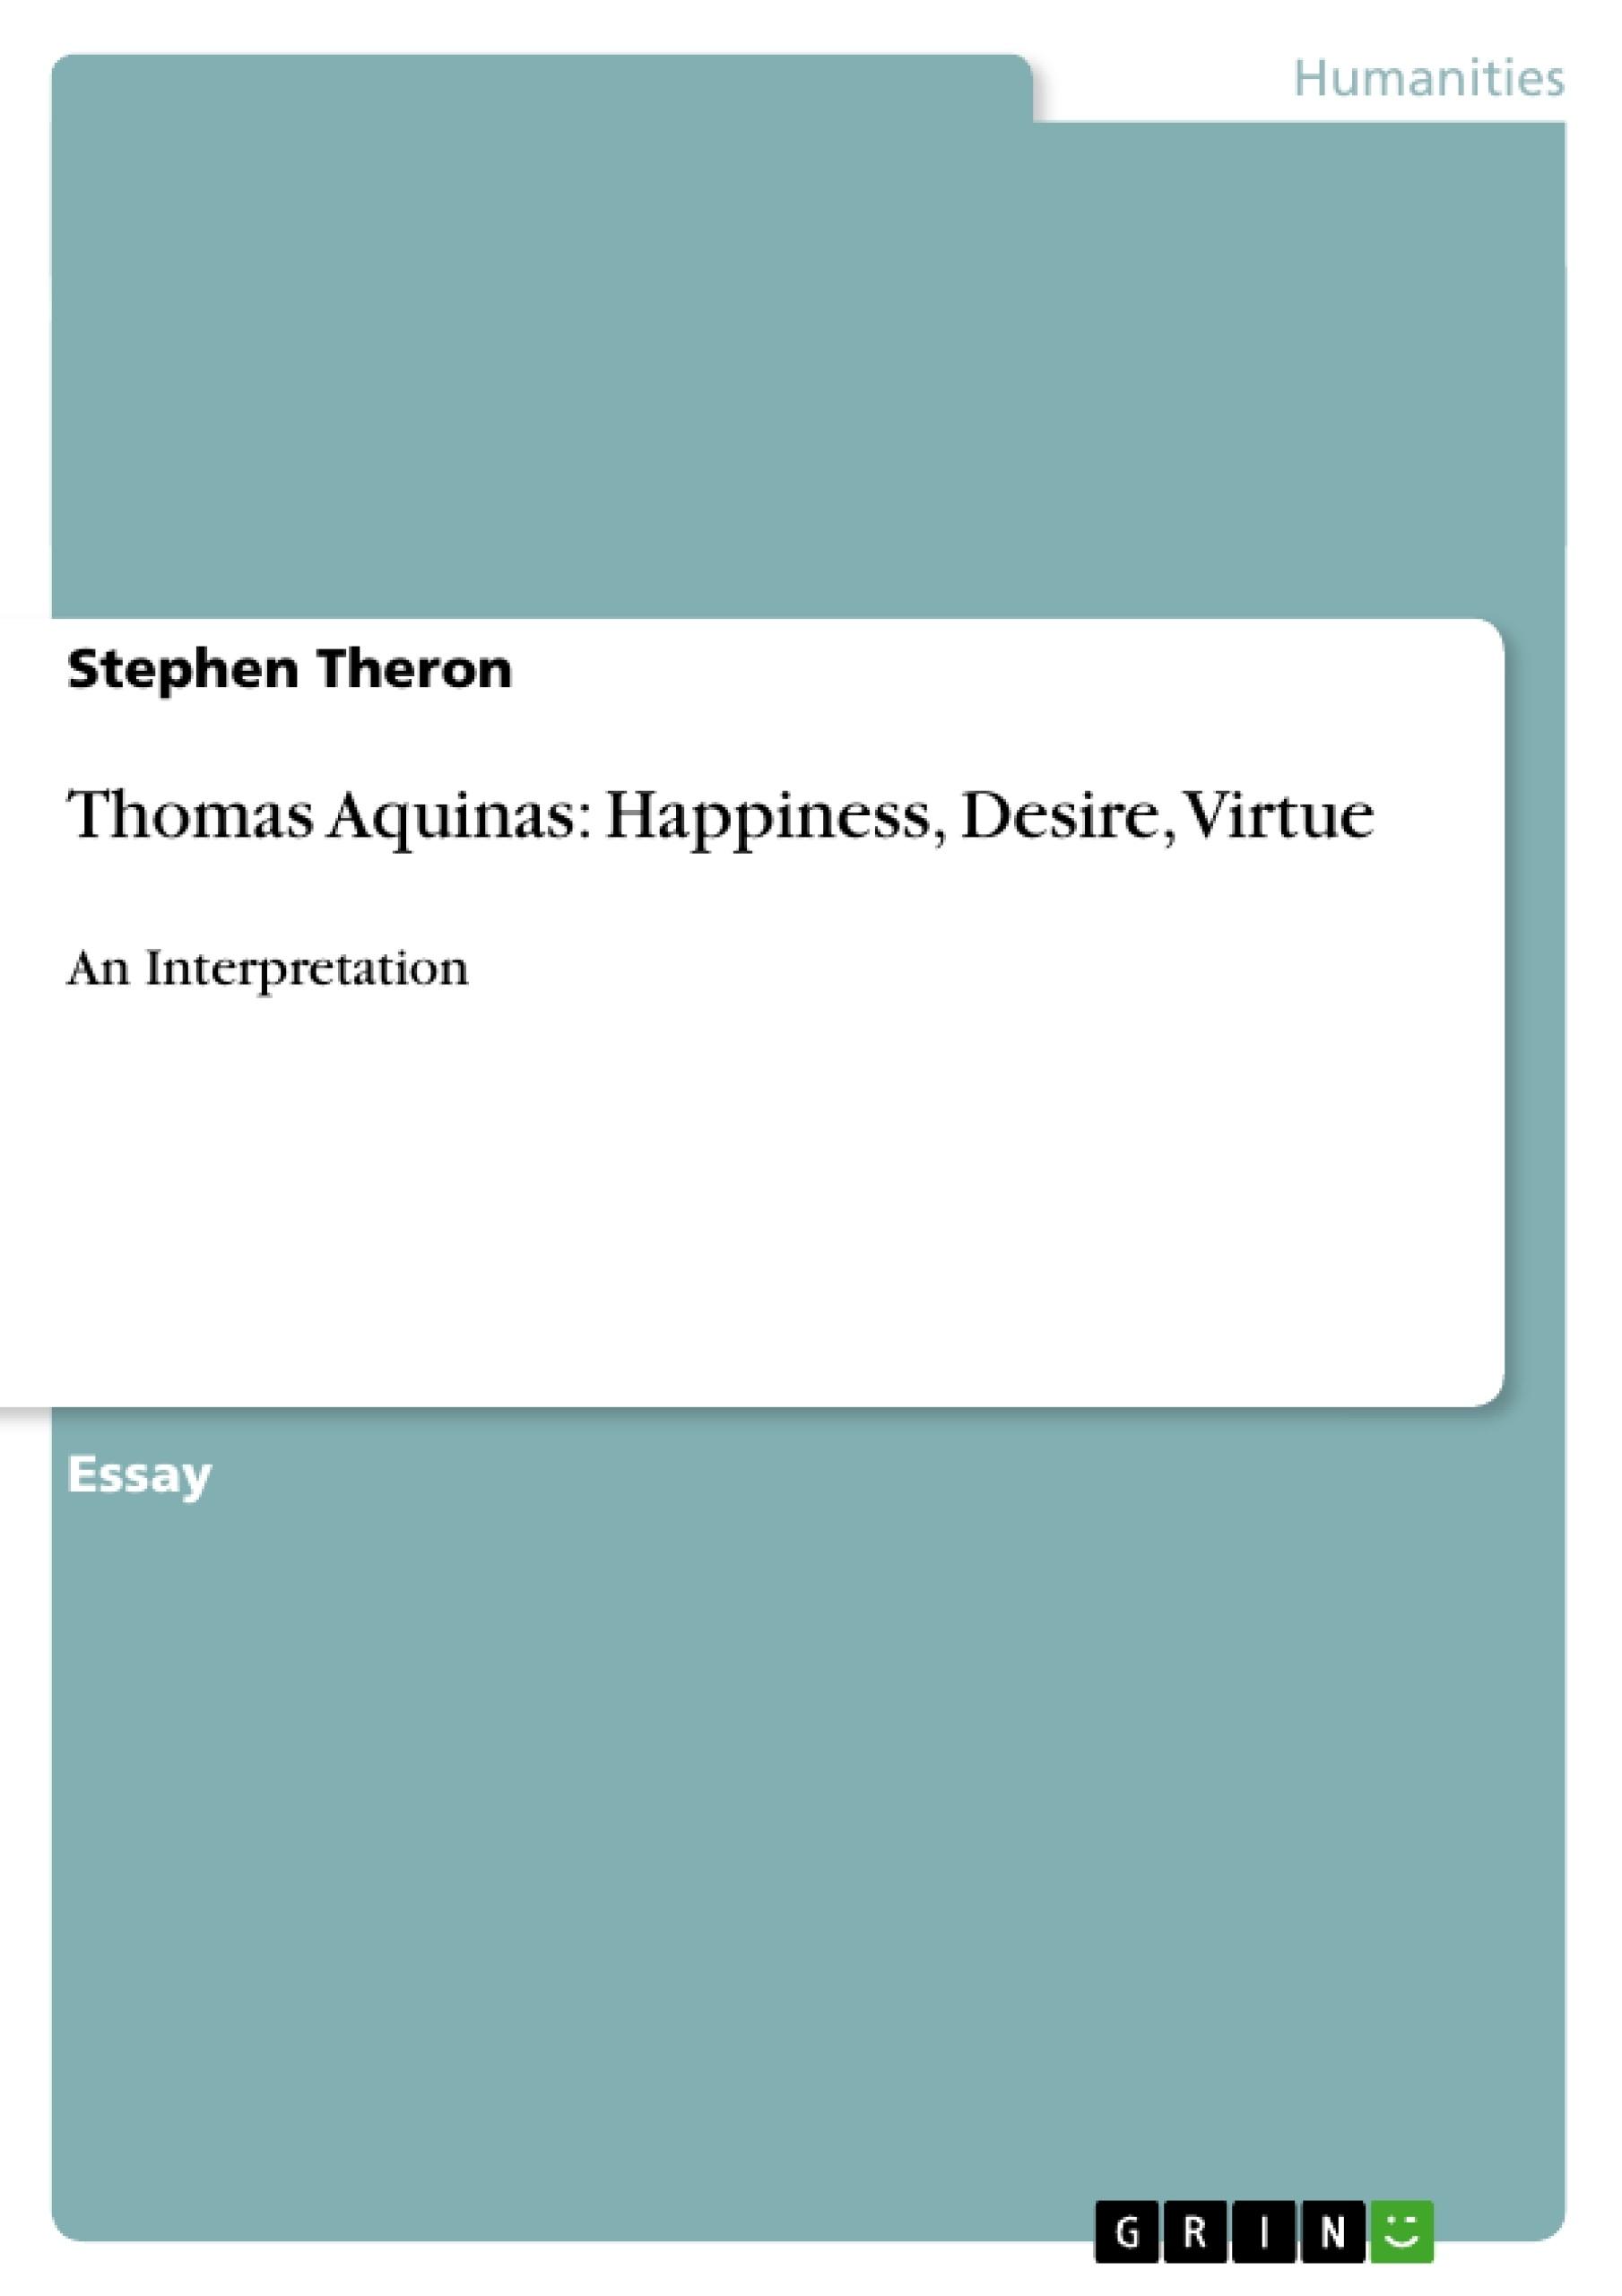 Title: Thomas Aquinas: Happiness, Desire, Virtue